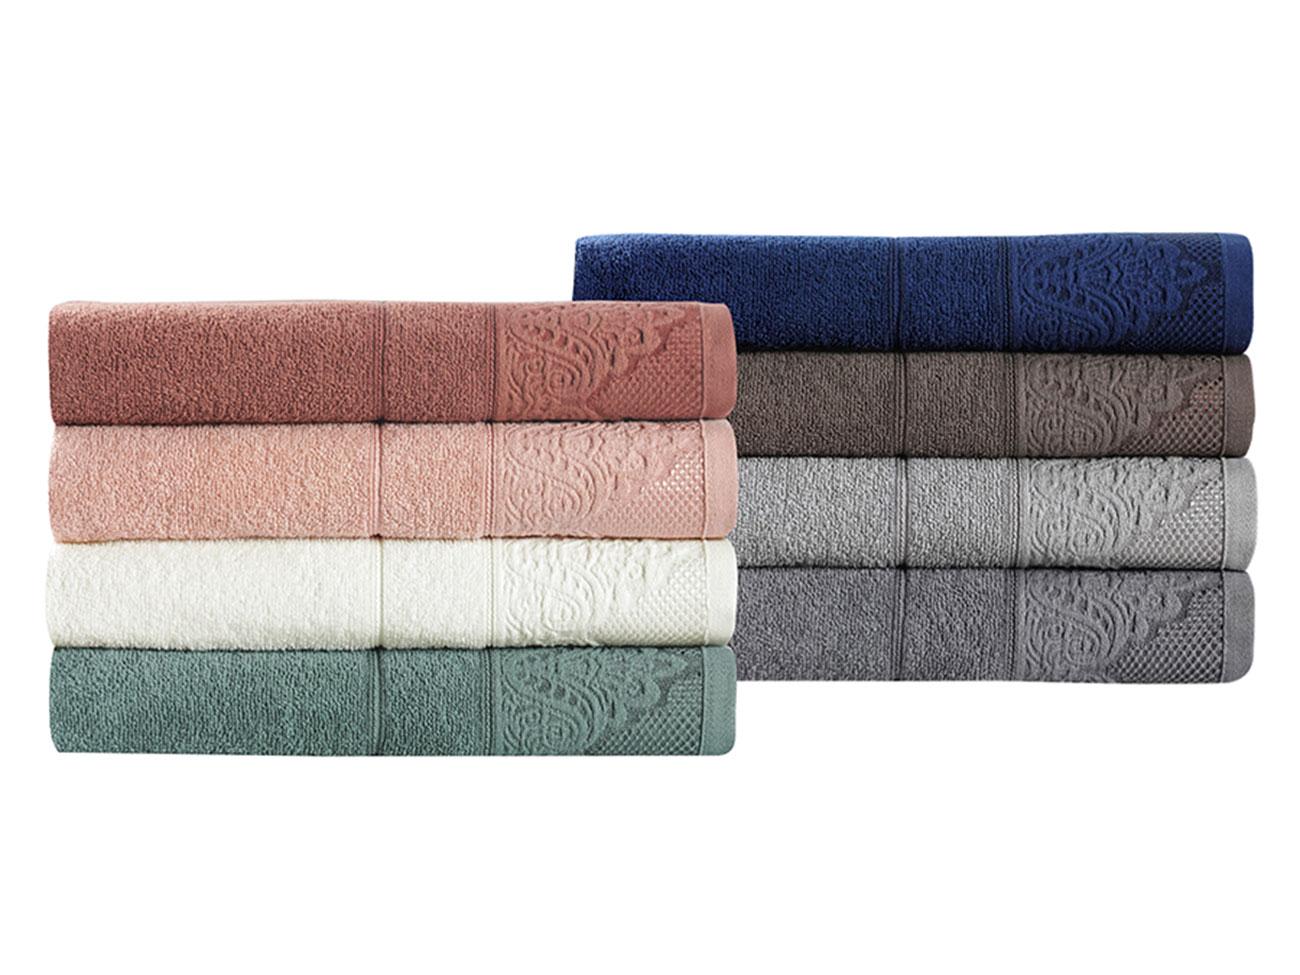 Махровое жаккардовое полотенце (1 шт) 3572 Siesta Karna